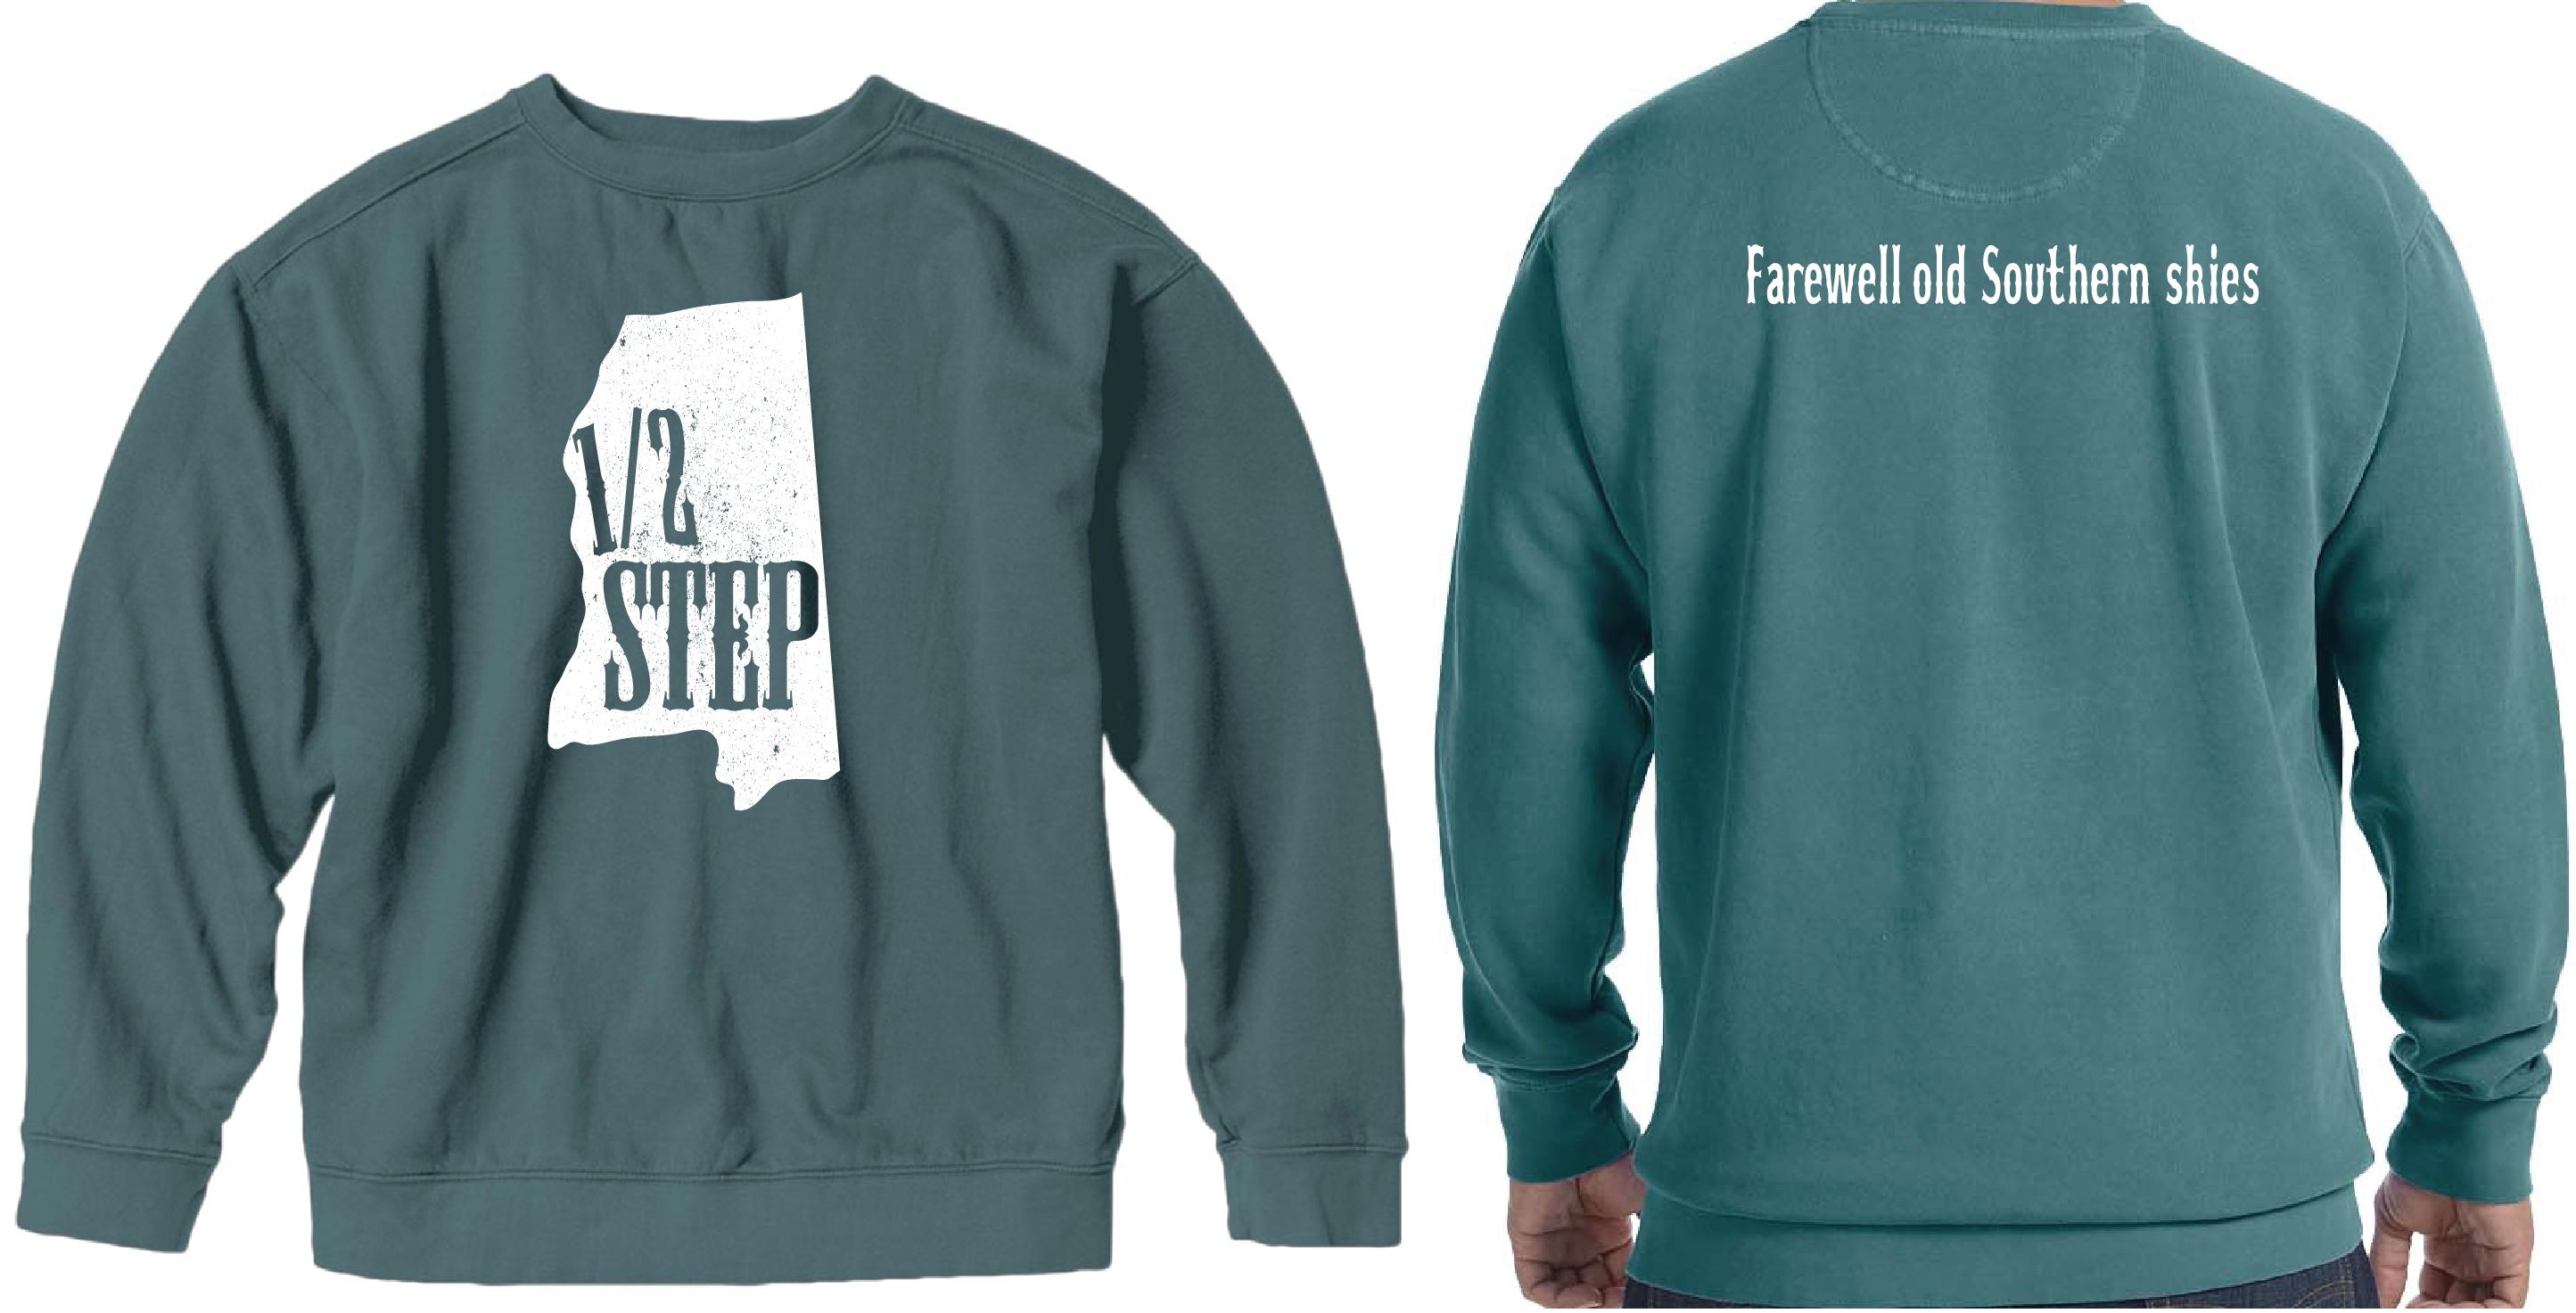 Ms Half Step Designs Grateful Sweats